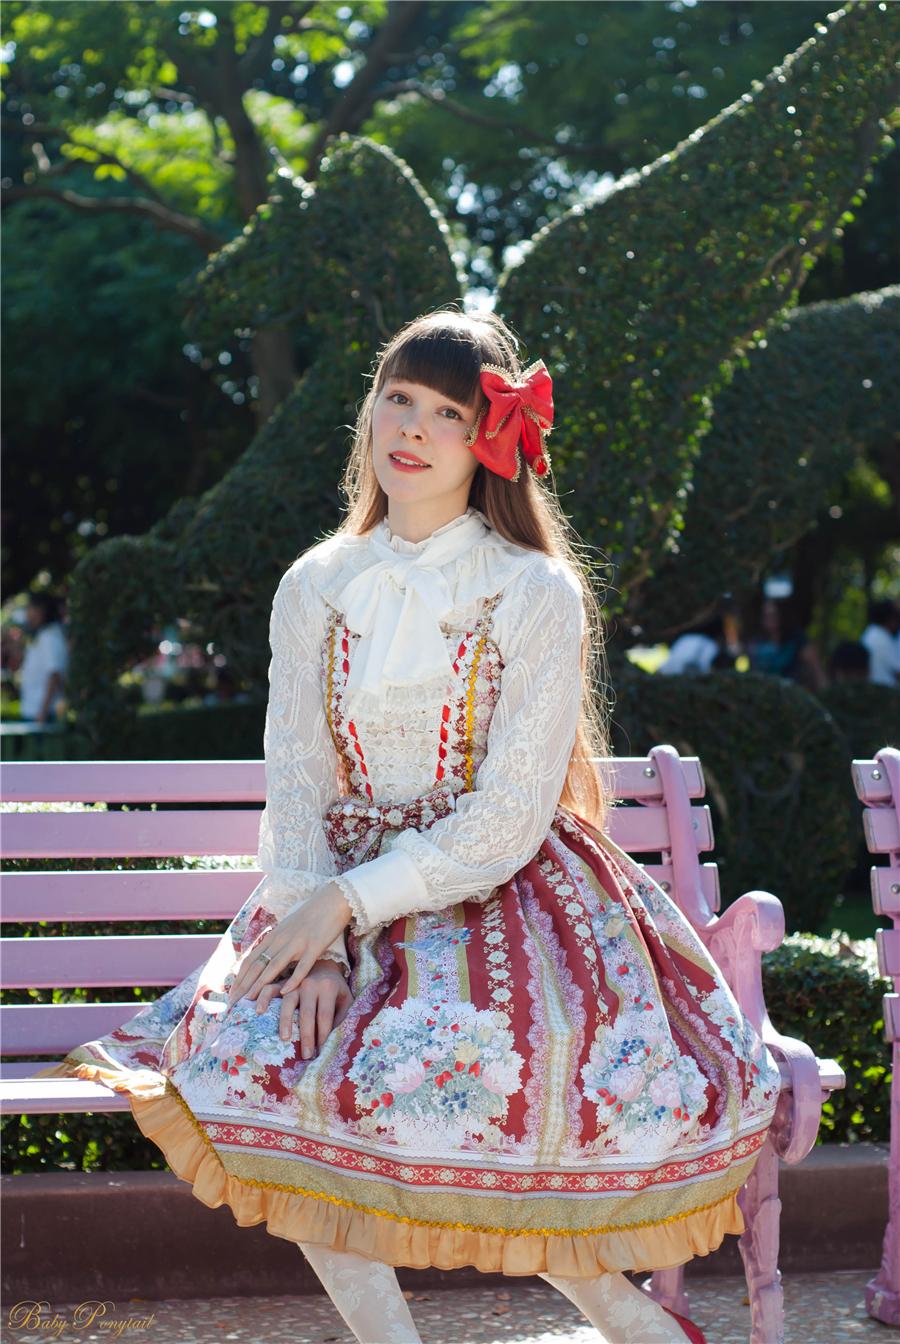 Baby Ponytail_Model Photo_Polly's Garden of Dreams_JSK Red_Claudia_8.jpg